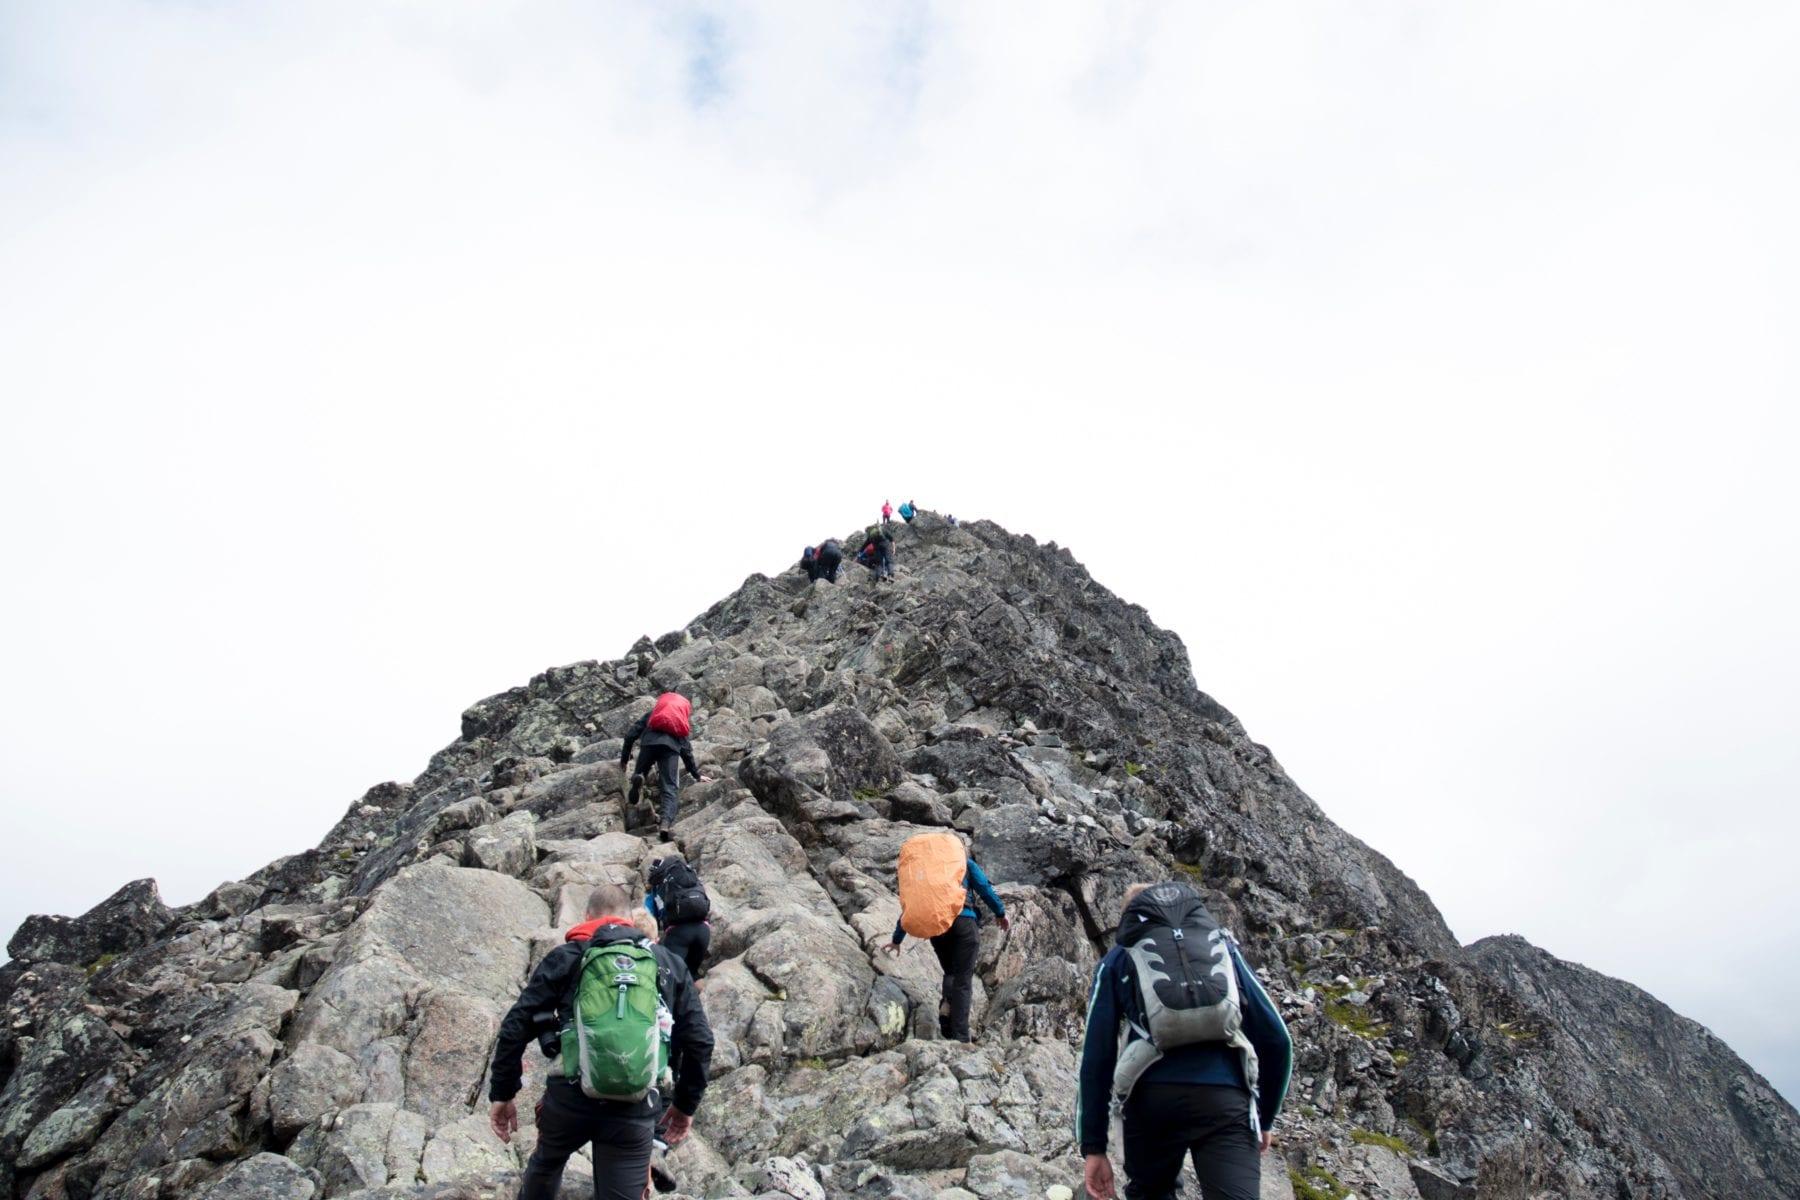 Mountain climbers reaching the peak of a rocky mountain.